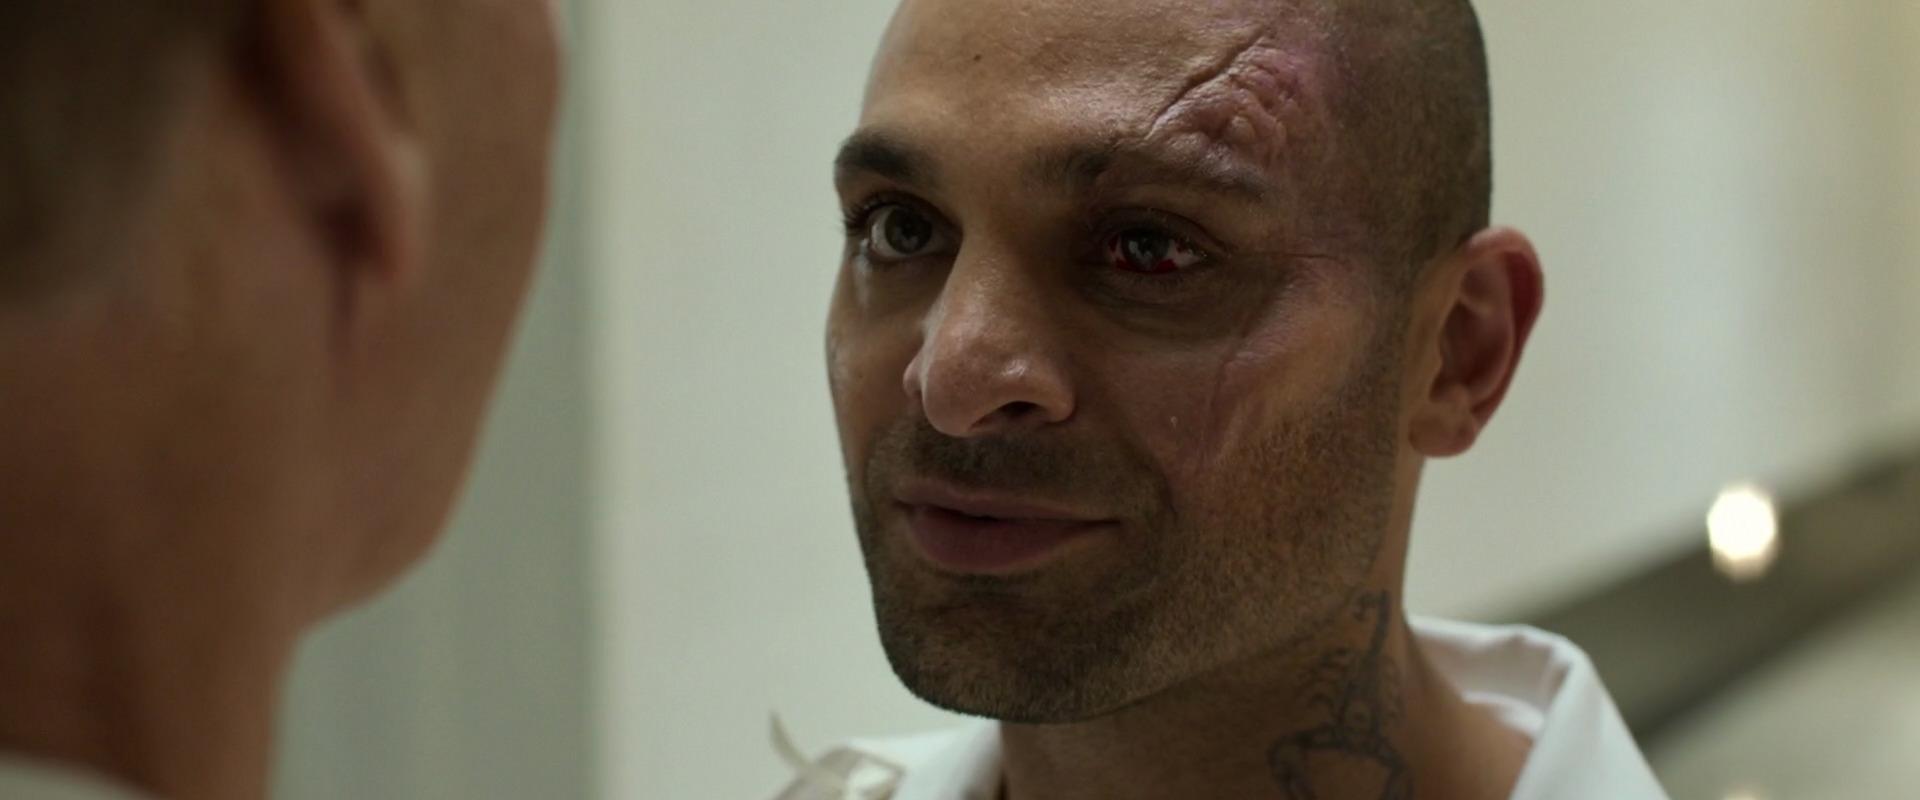 Mac Gargan damaged face